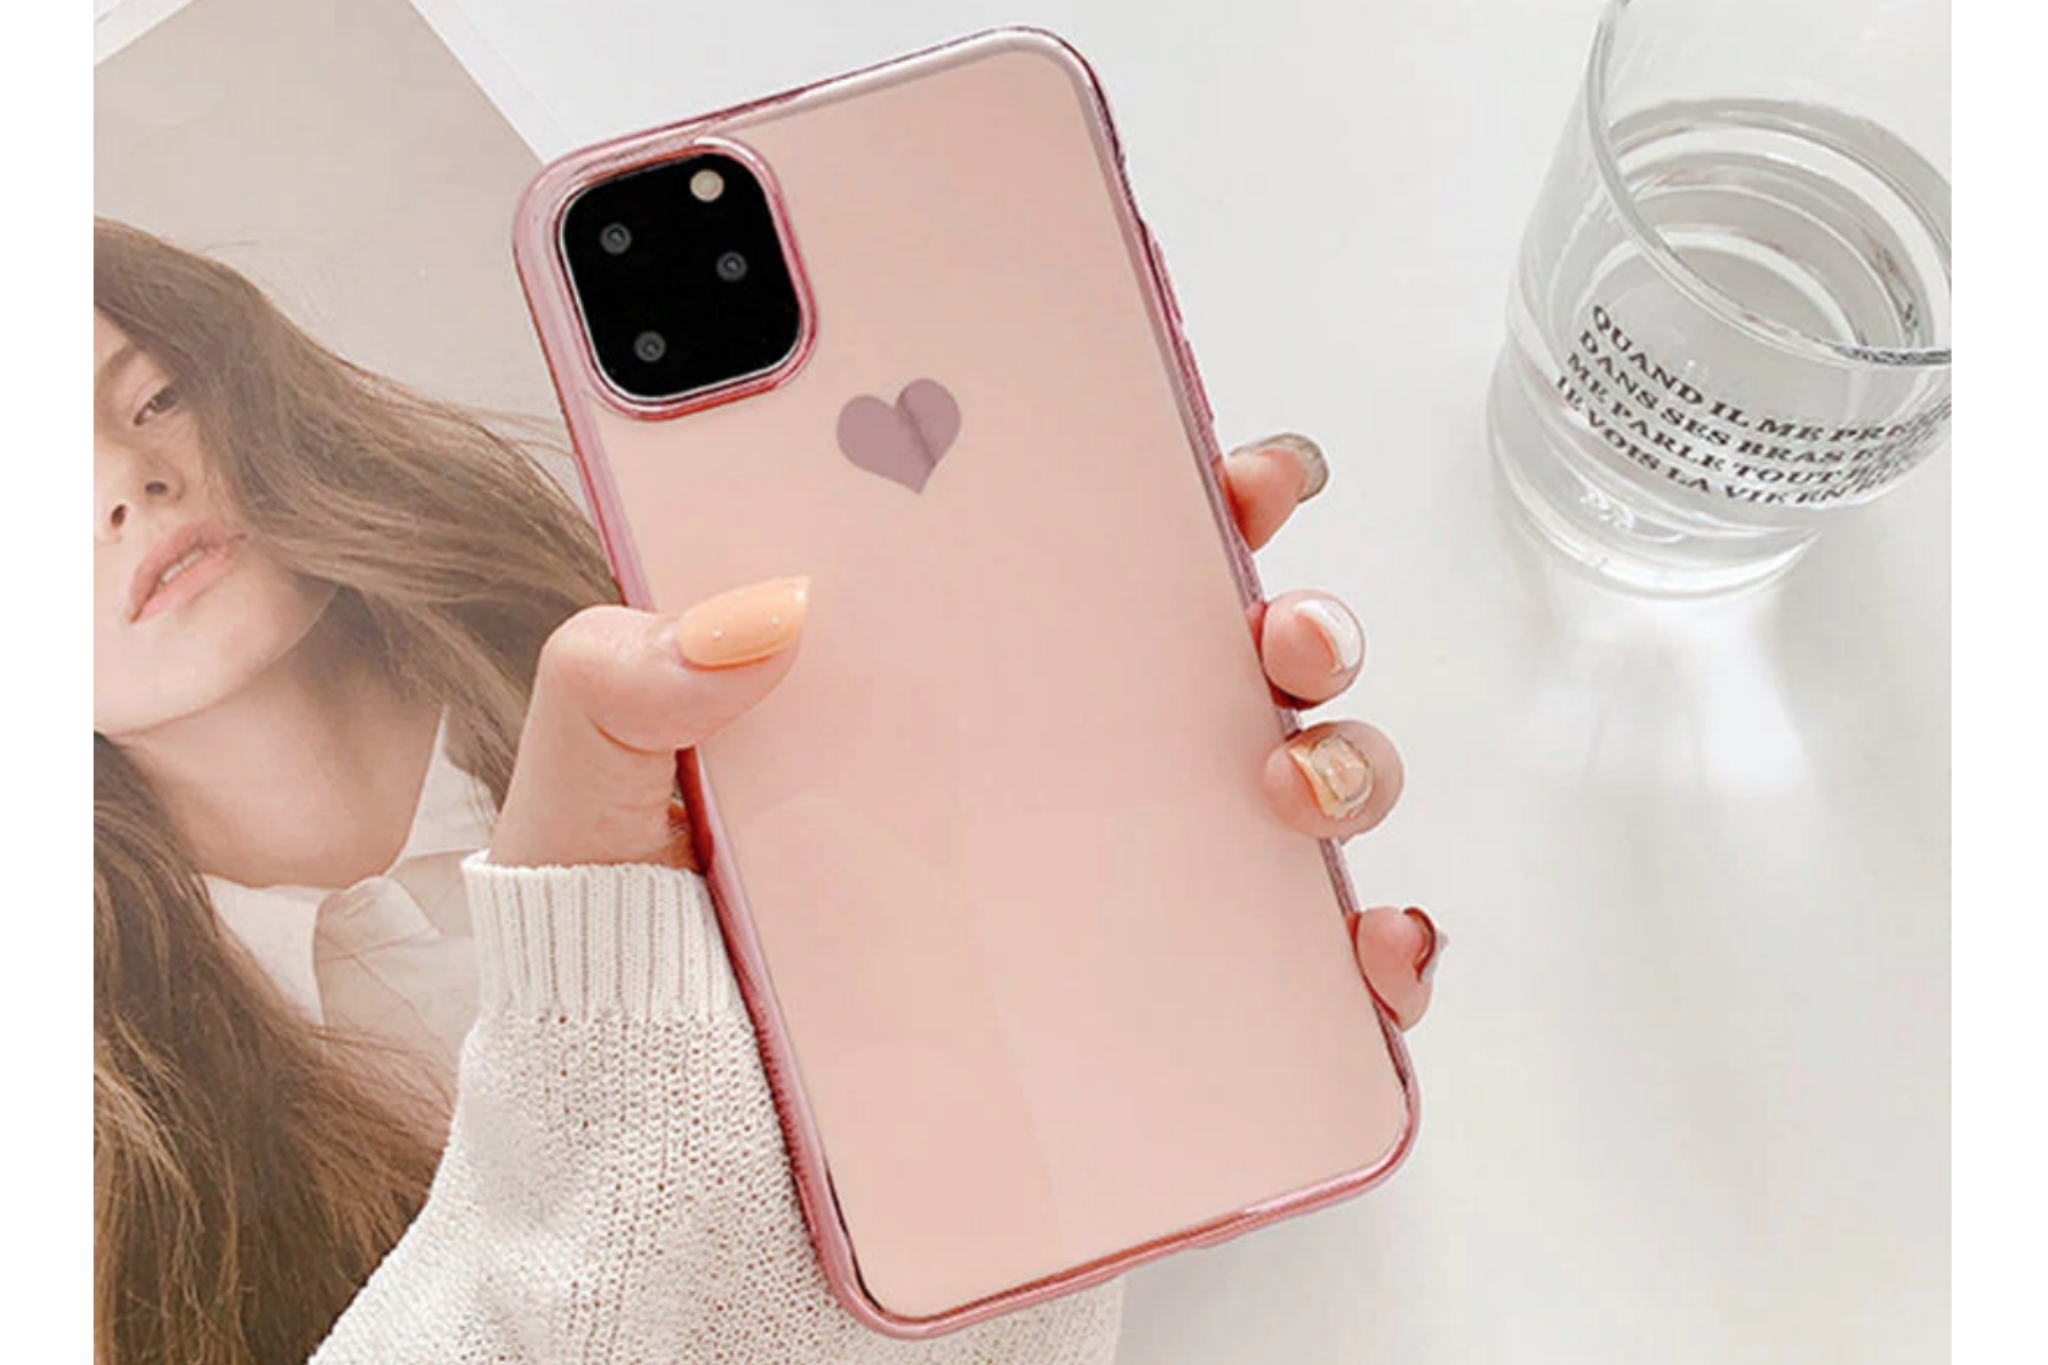 Smartphonehoesje iPhone 12 (Pro) | Poederroze